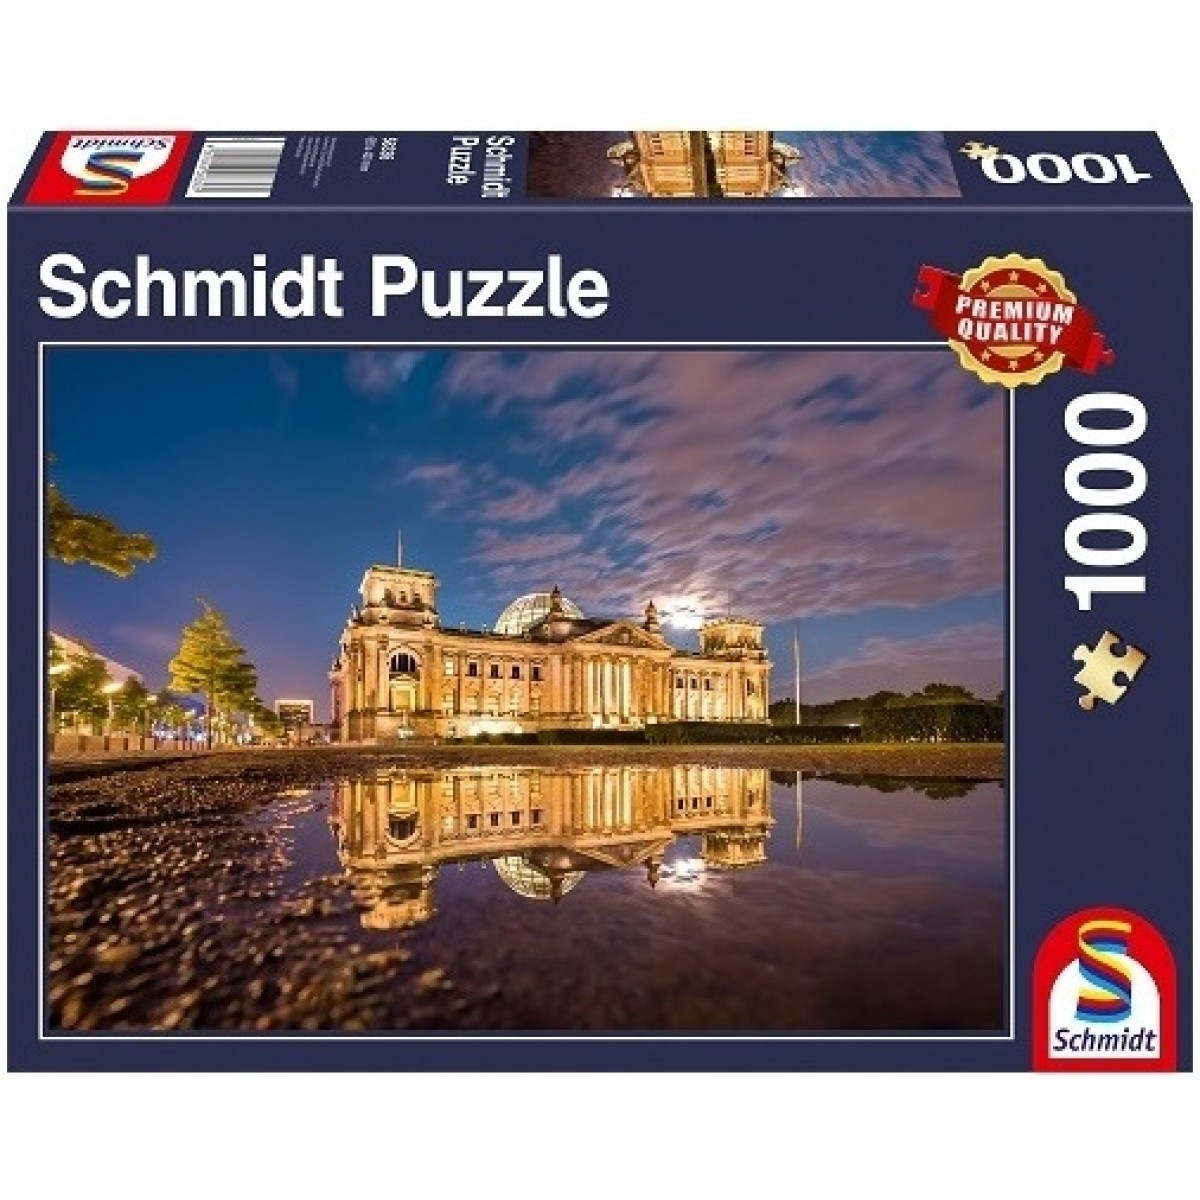 Sestavljanka puzzle 1000 delna Schmidt Berlin Reichstag parlament